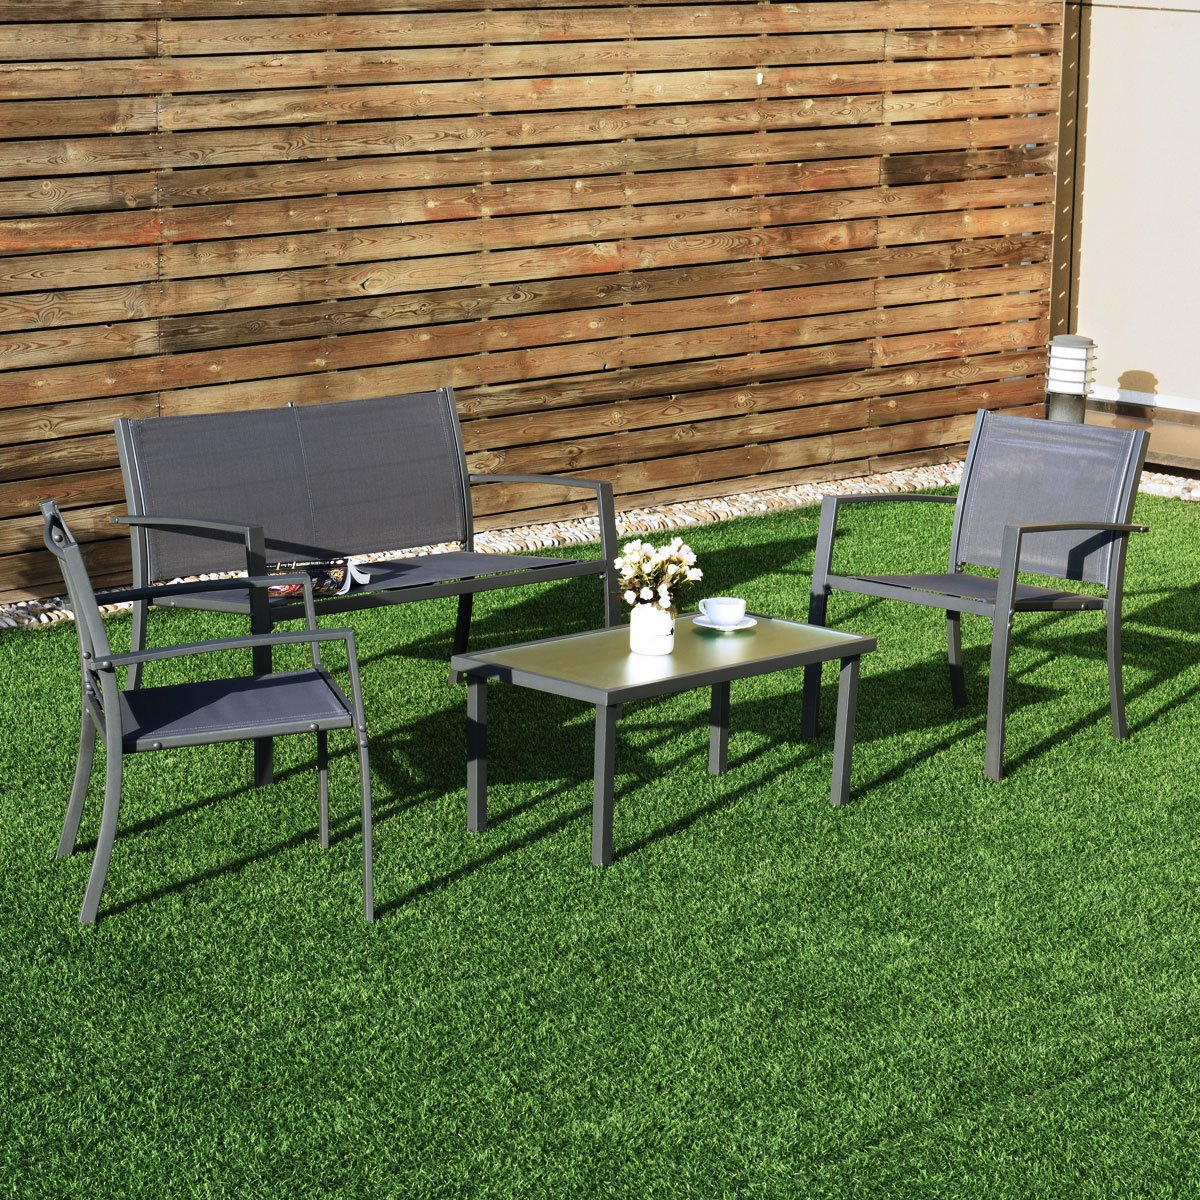 Galvanized Patio Furniture.Tangkula 6pc Patio Furniture Set Outdoor Garden Backyard Poolside